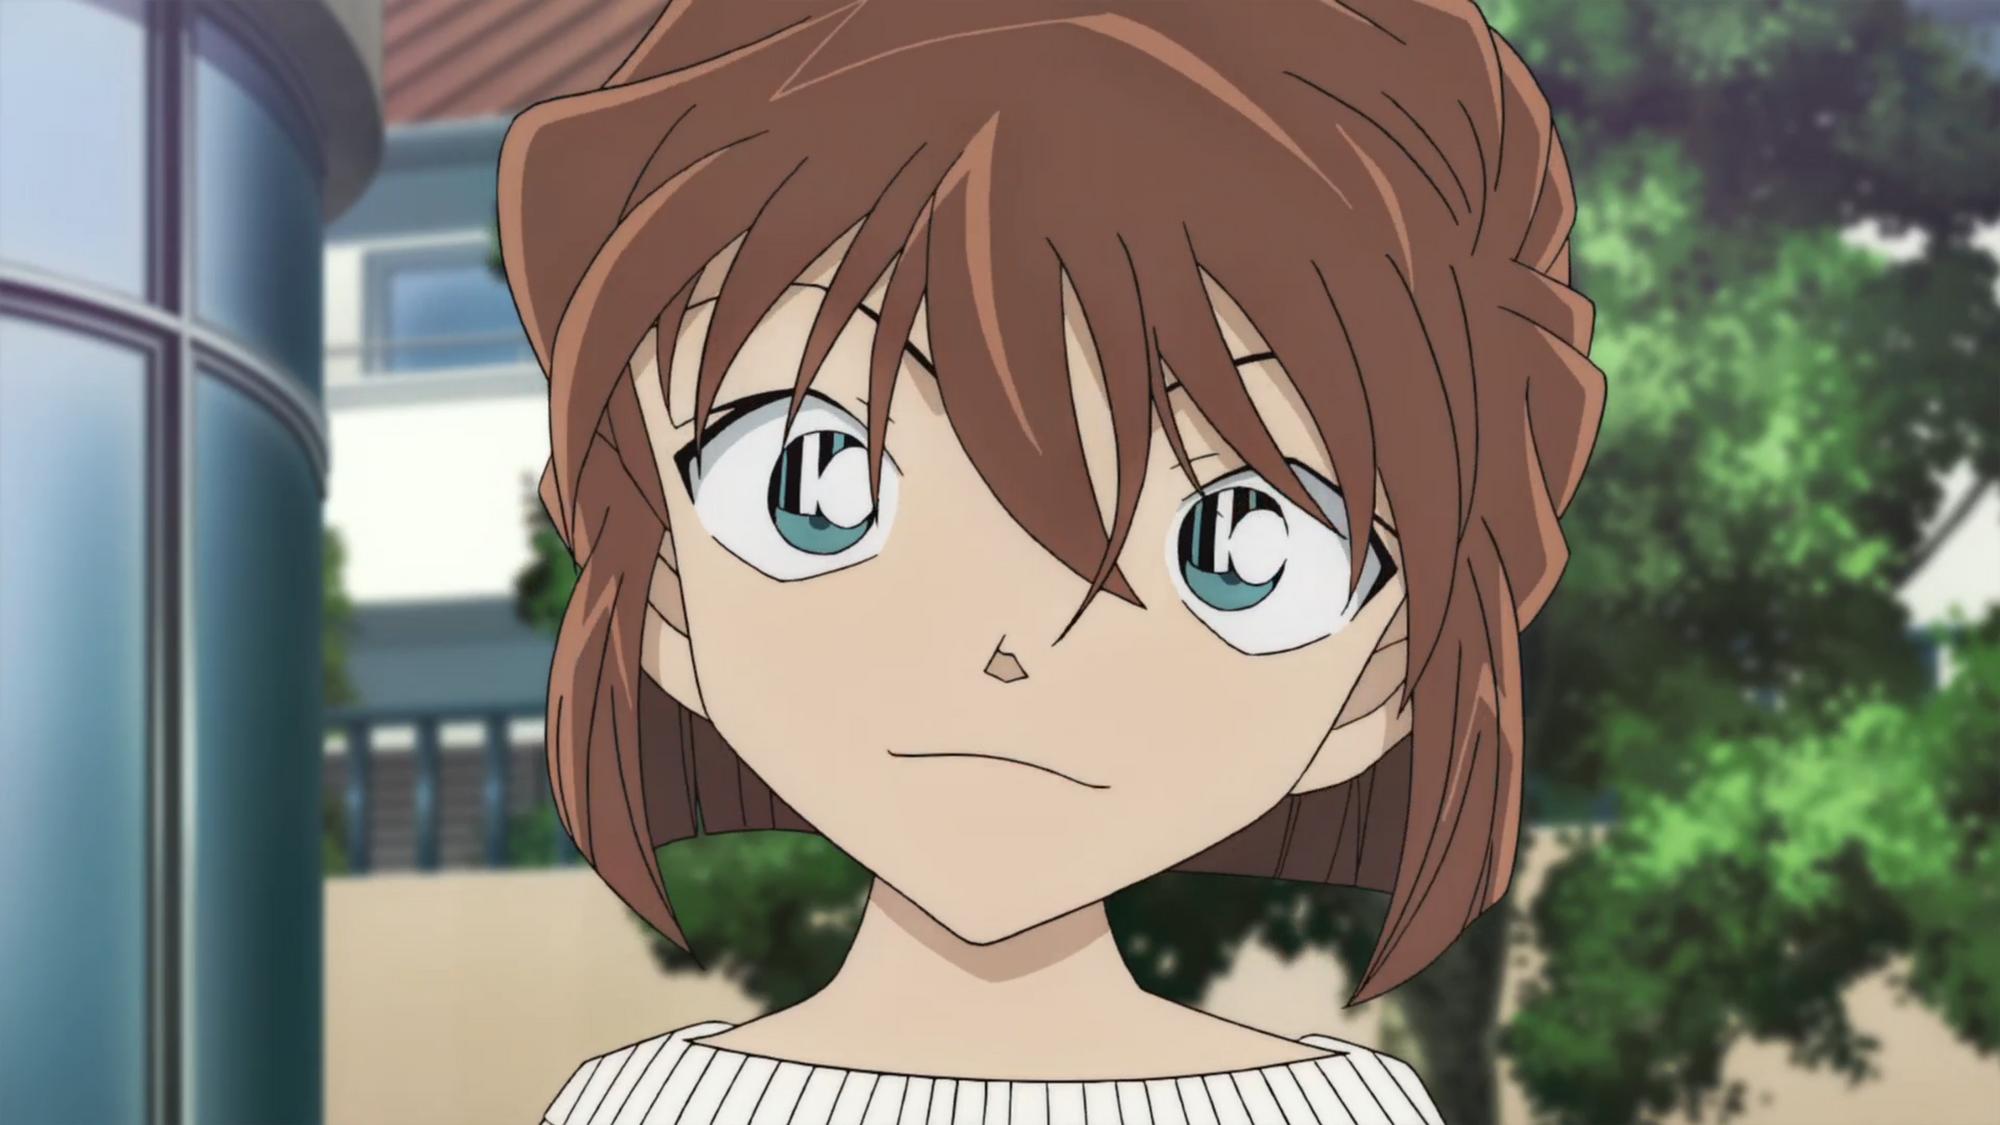 Ai Haibara | Detective Conan Wiki | FANDOM powered by Wikia